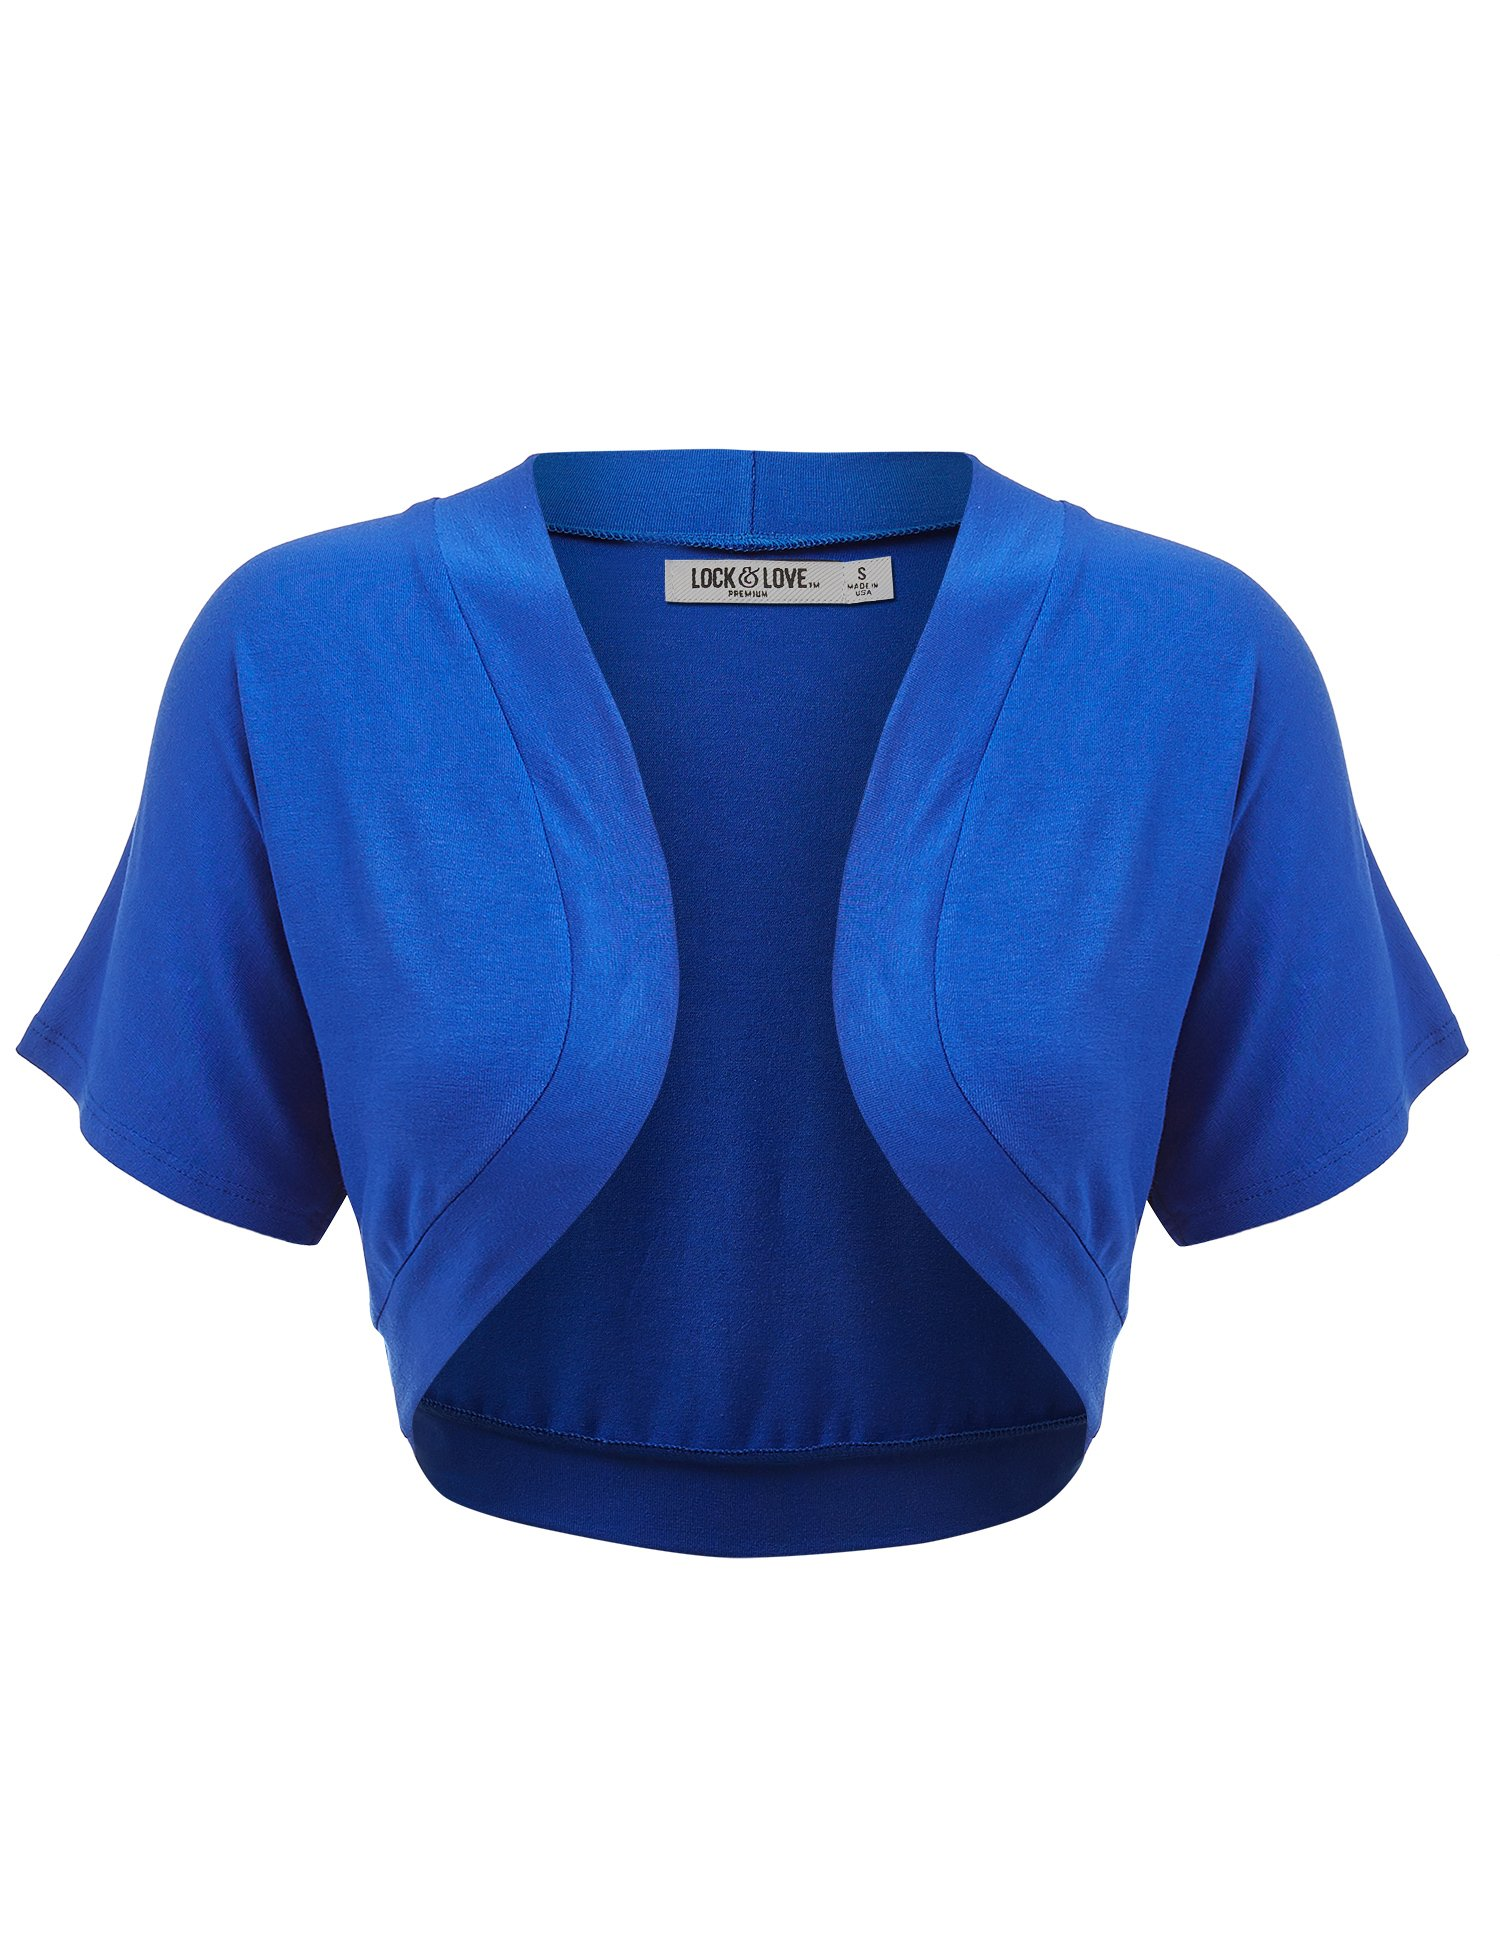 WSK1785 Womens Short Sleeve Shrug Open Cardigan XL Royal_Brite